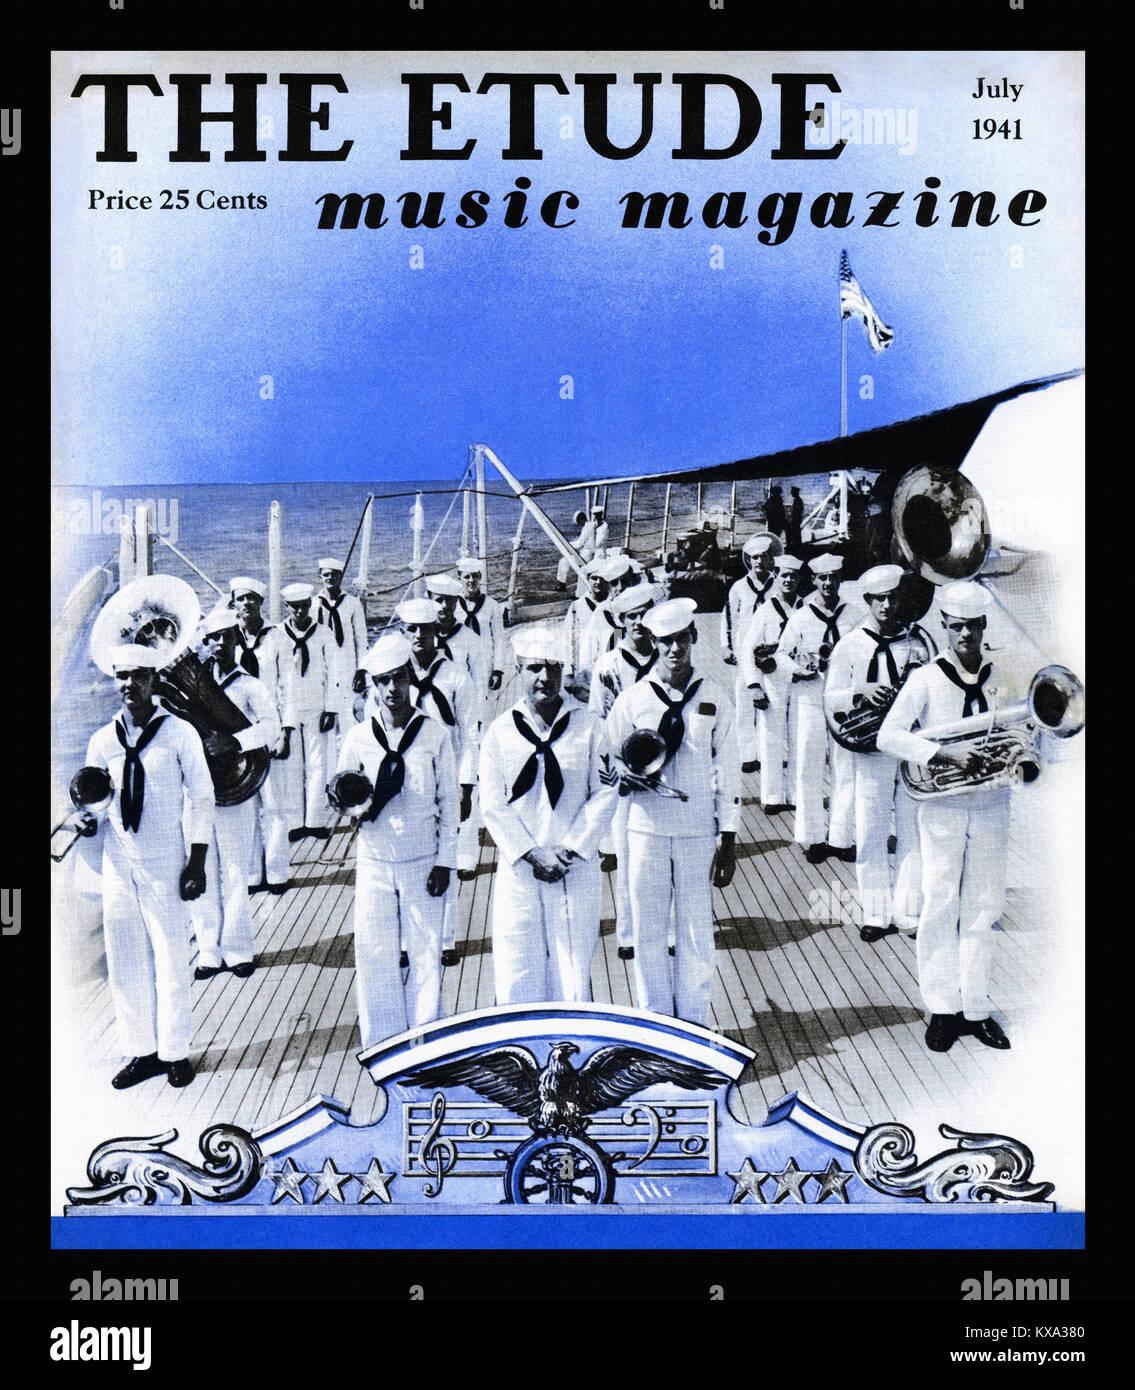 Band of Sailors - Stock Image